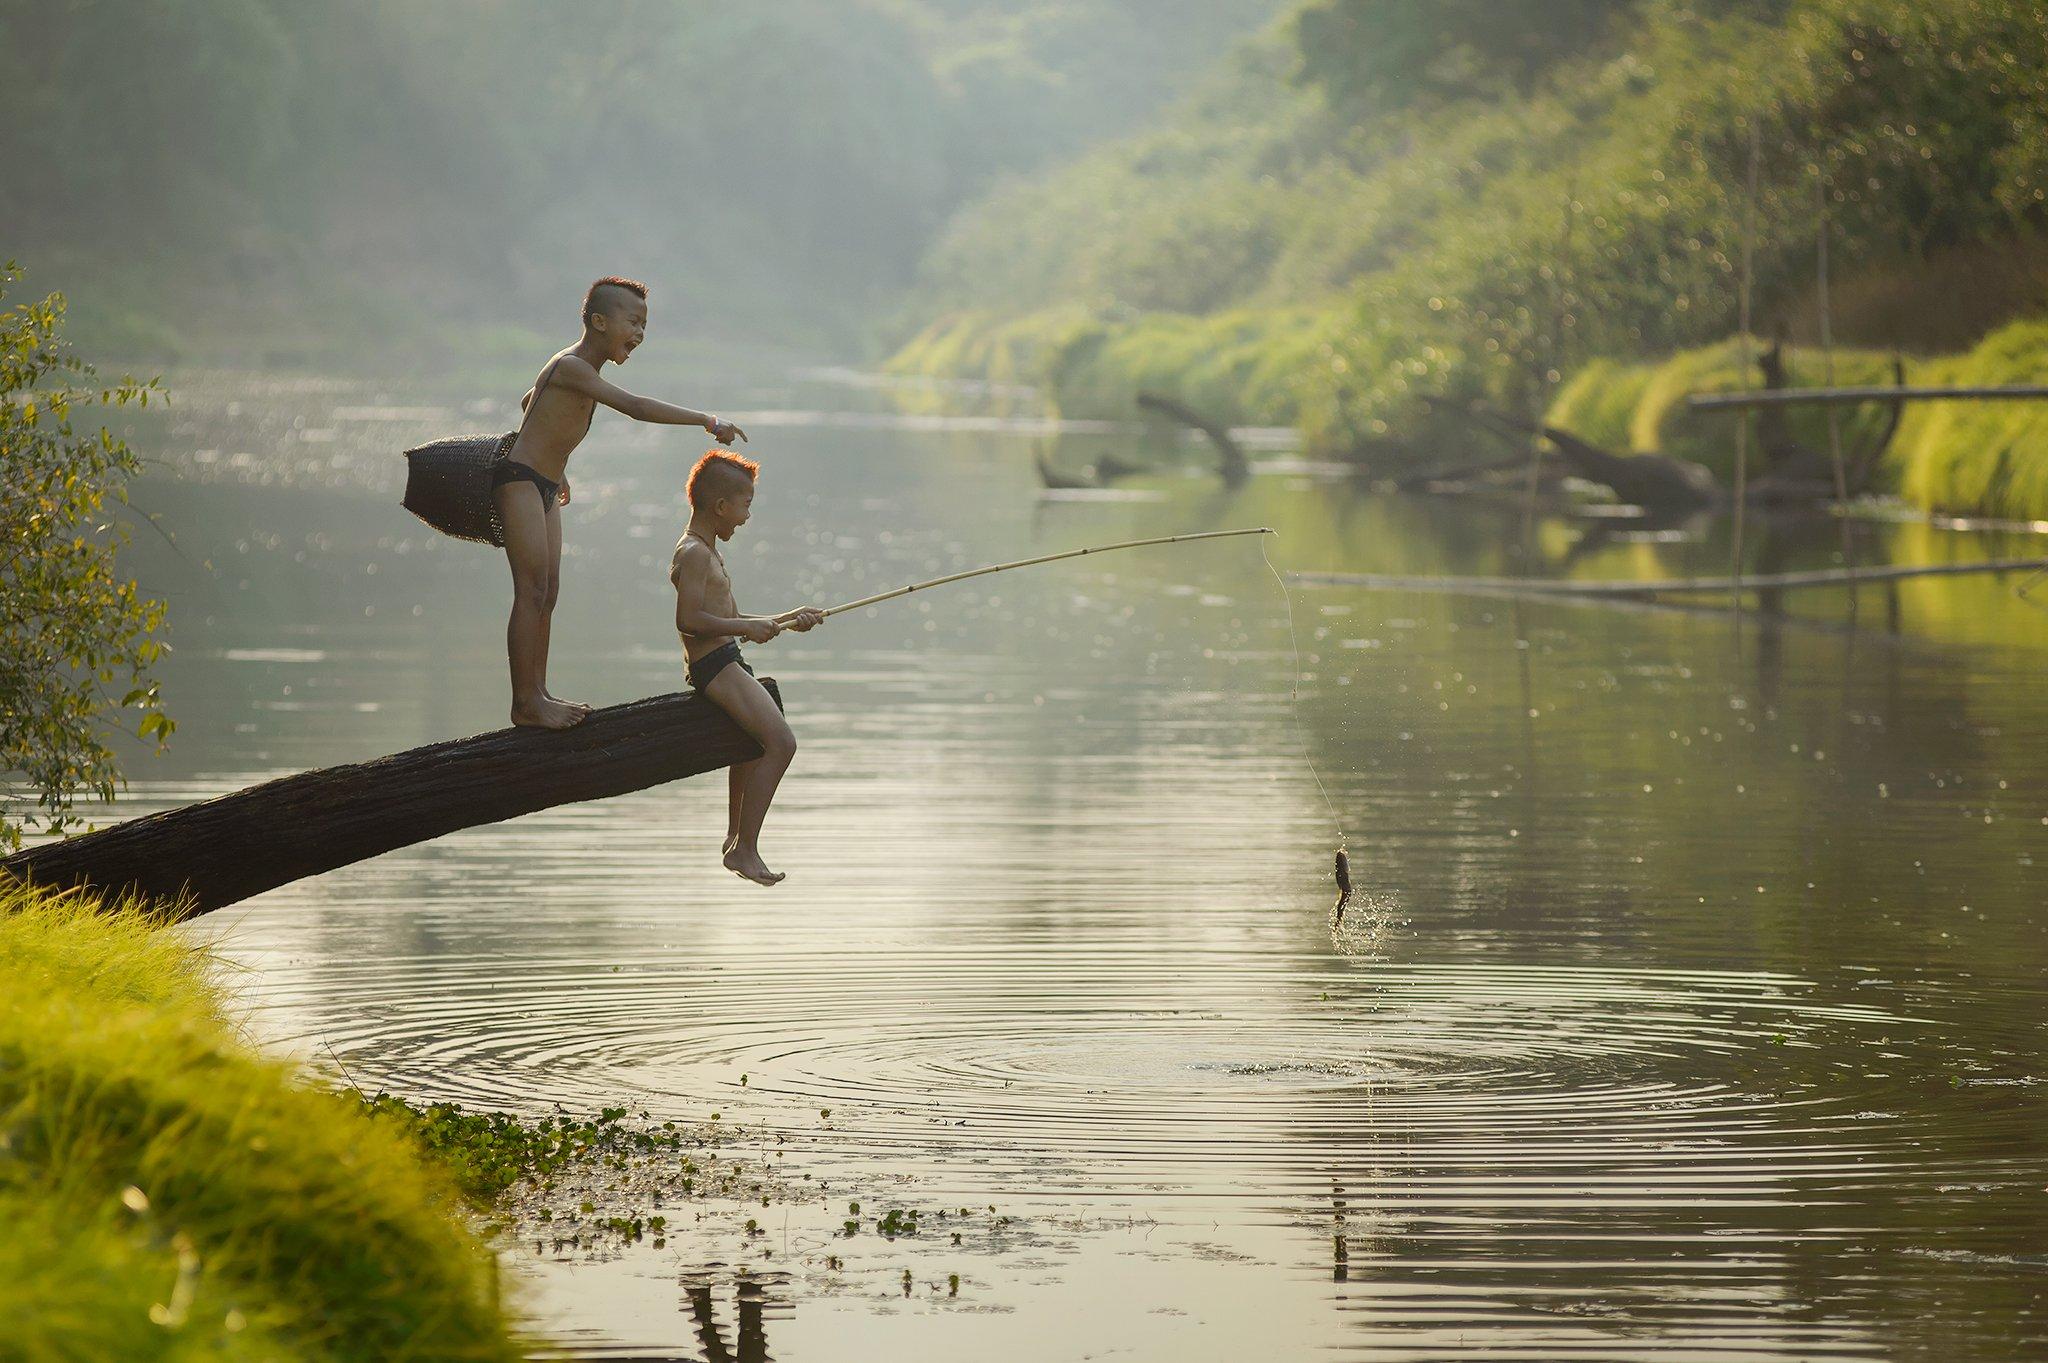 Action, Asia, Boy, Child, Children, Fisherman, Fishing, Outdoor, River, Saravut Whanset